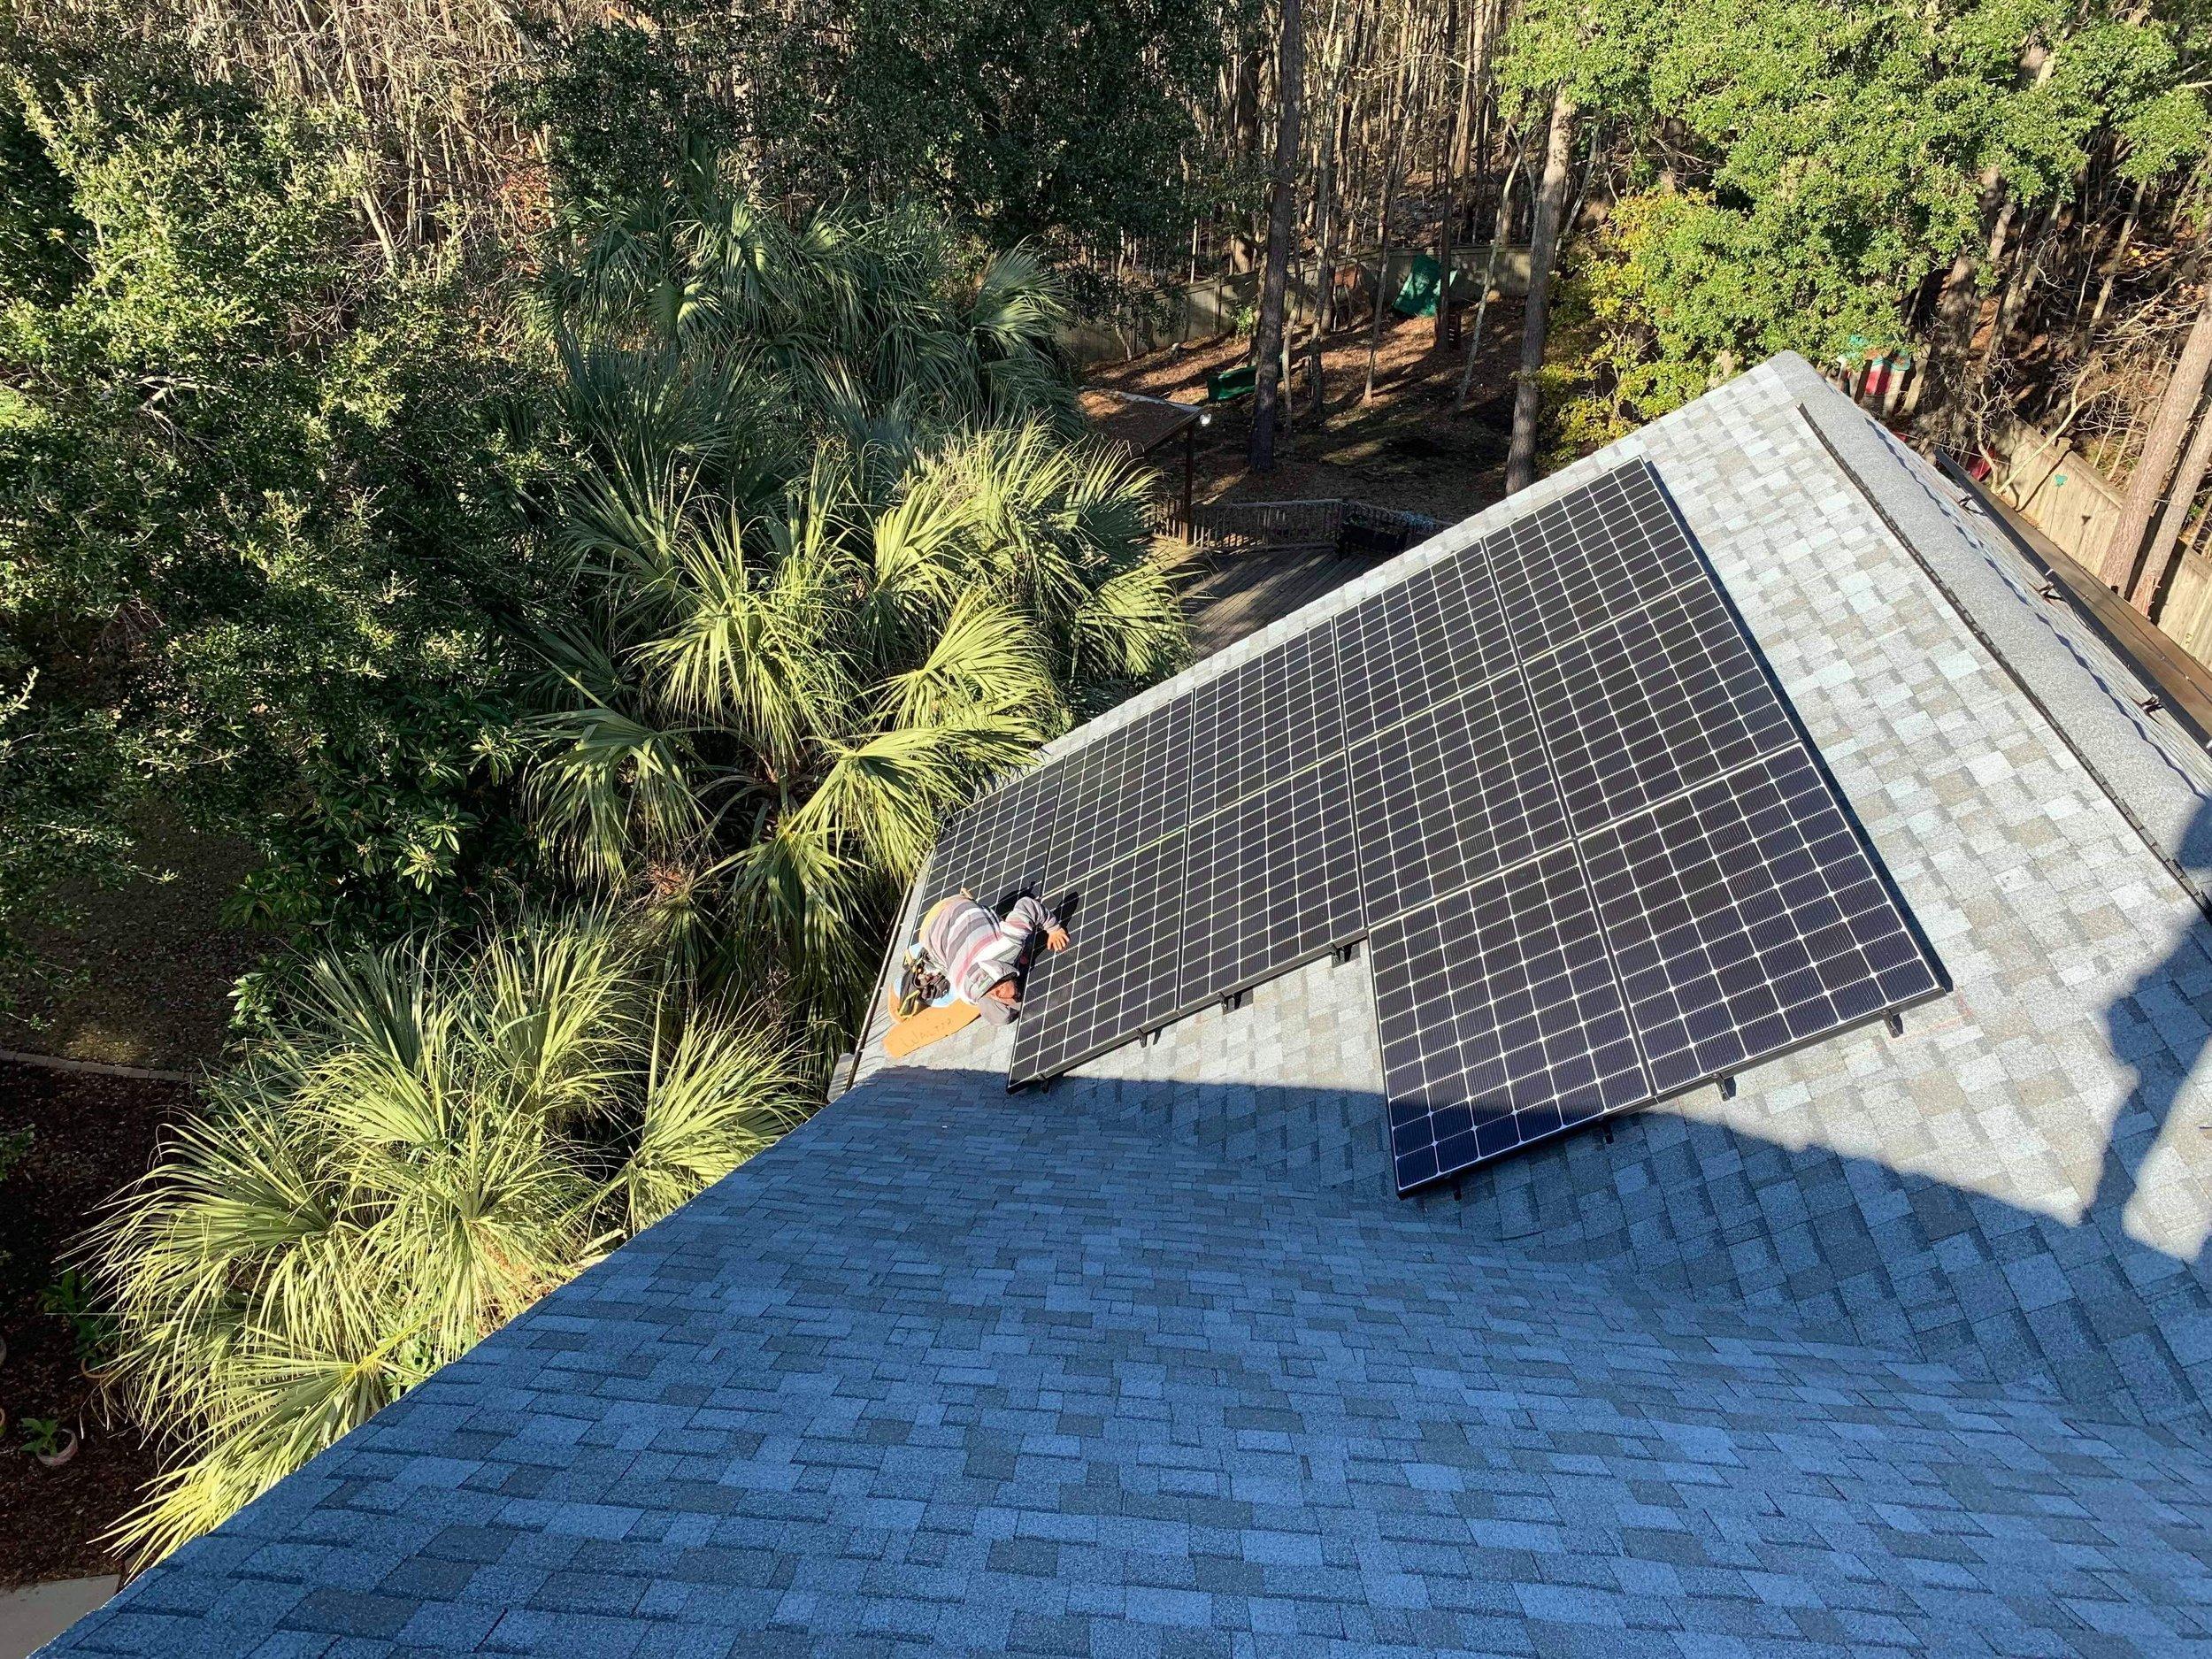 Mt. Pleasant, South Carolina solar installation